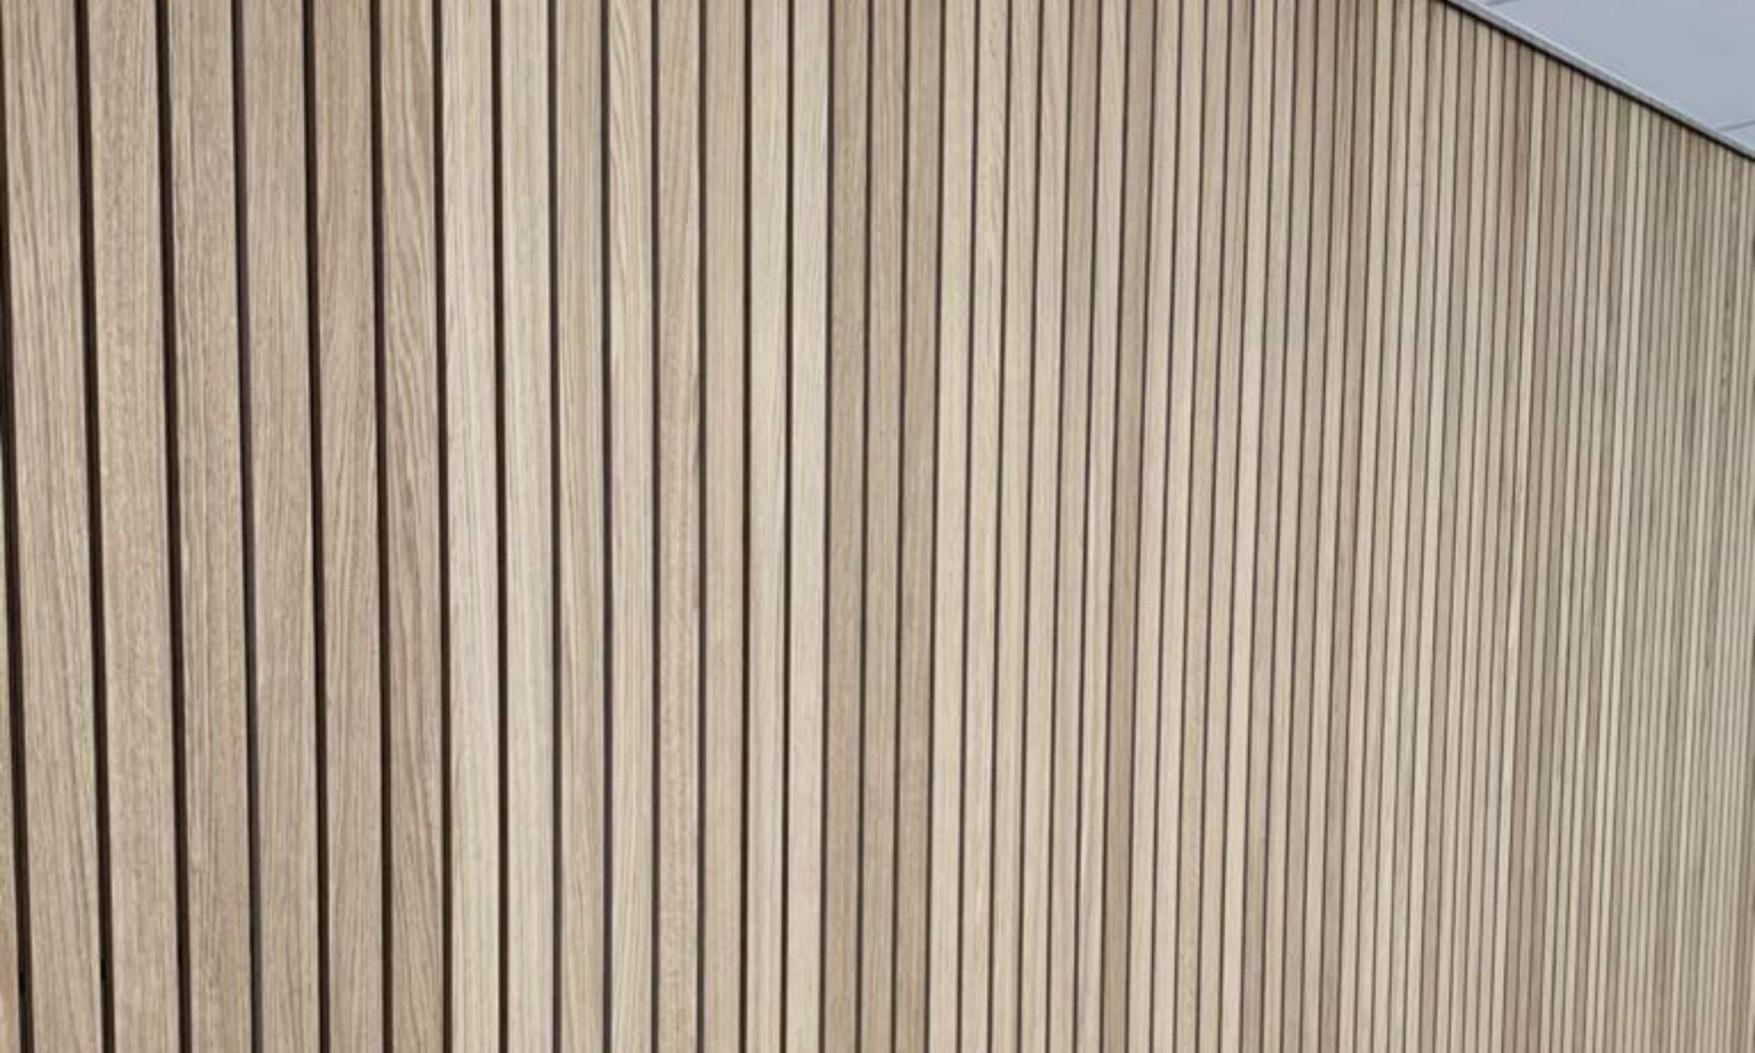 Harryvan Interieurbouw | latten plafond en wandbekleding (Aletta Jacobshal Groningen)